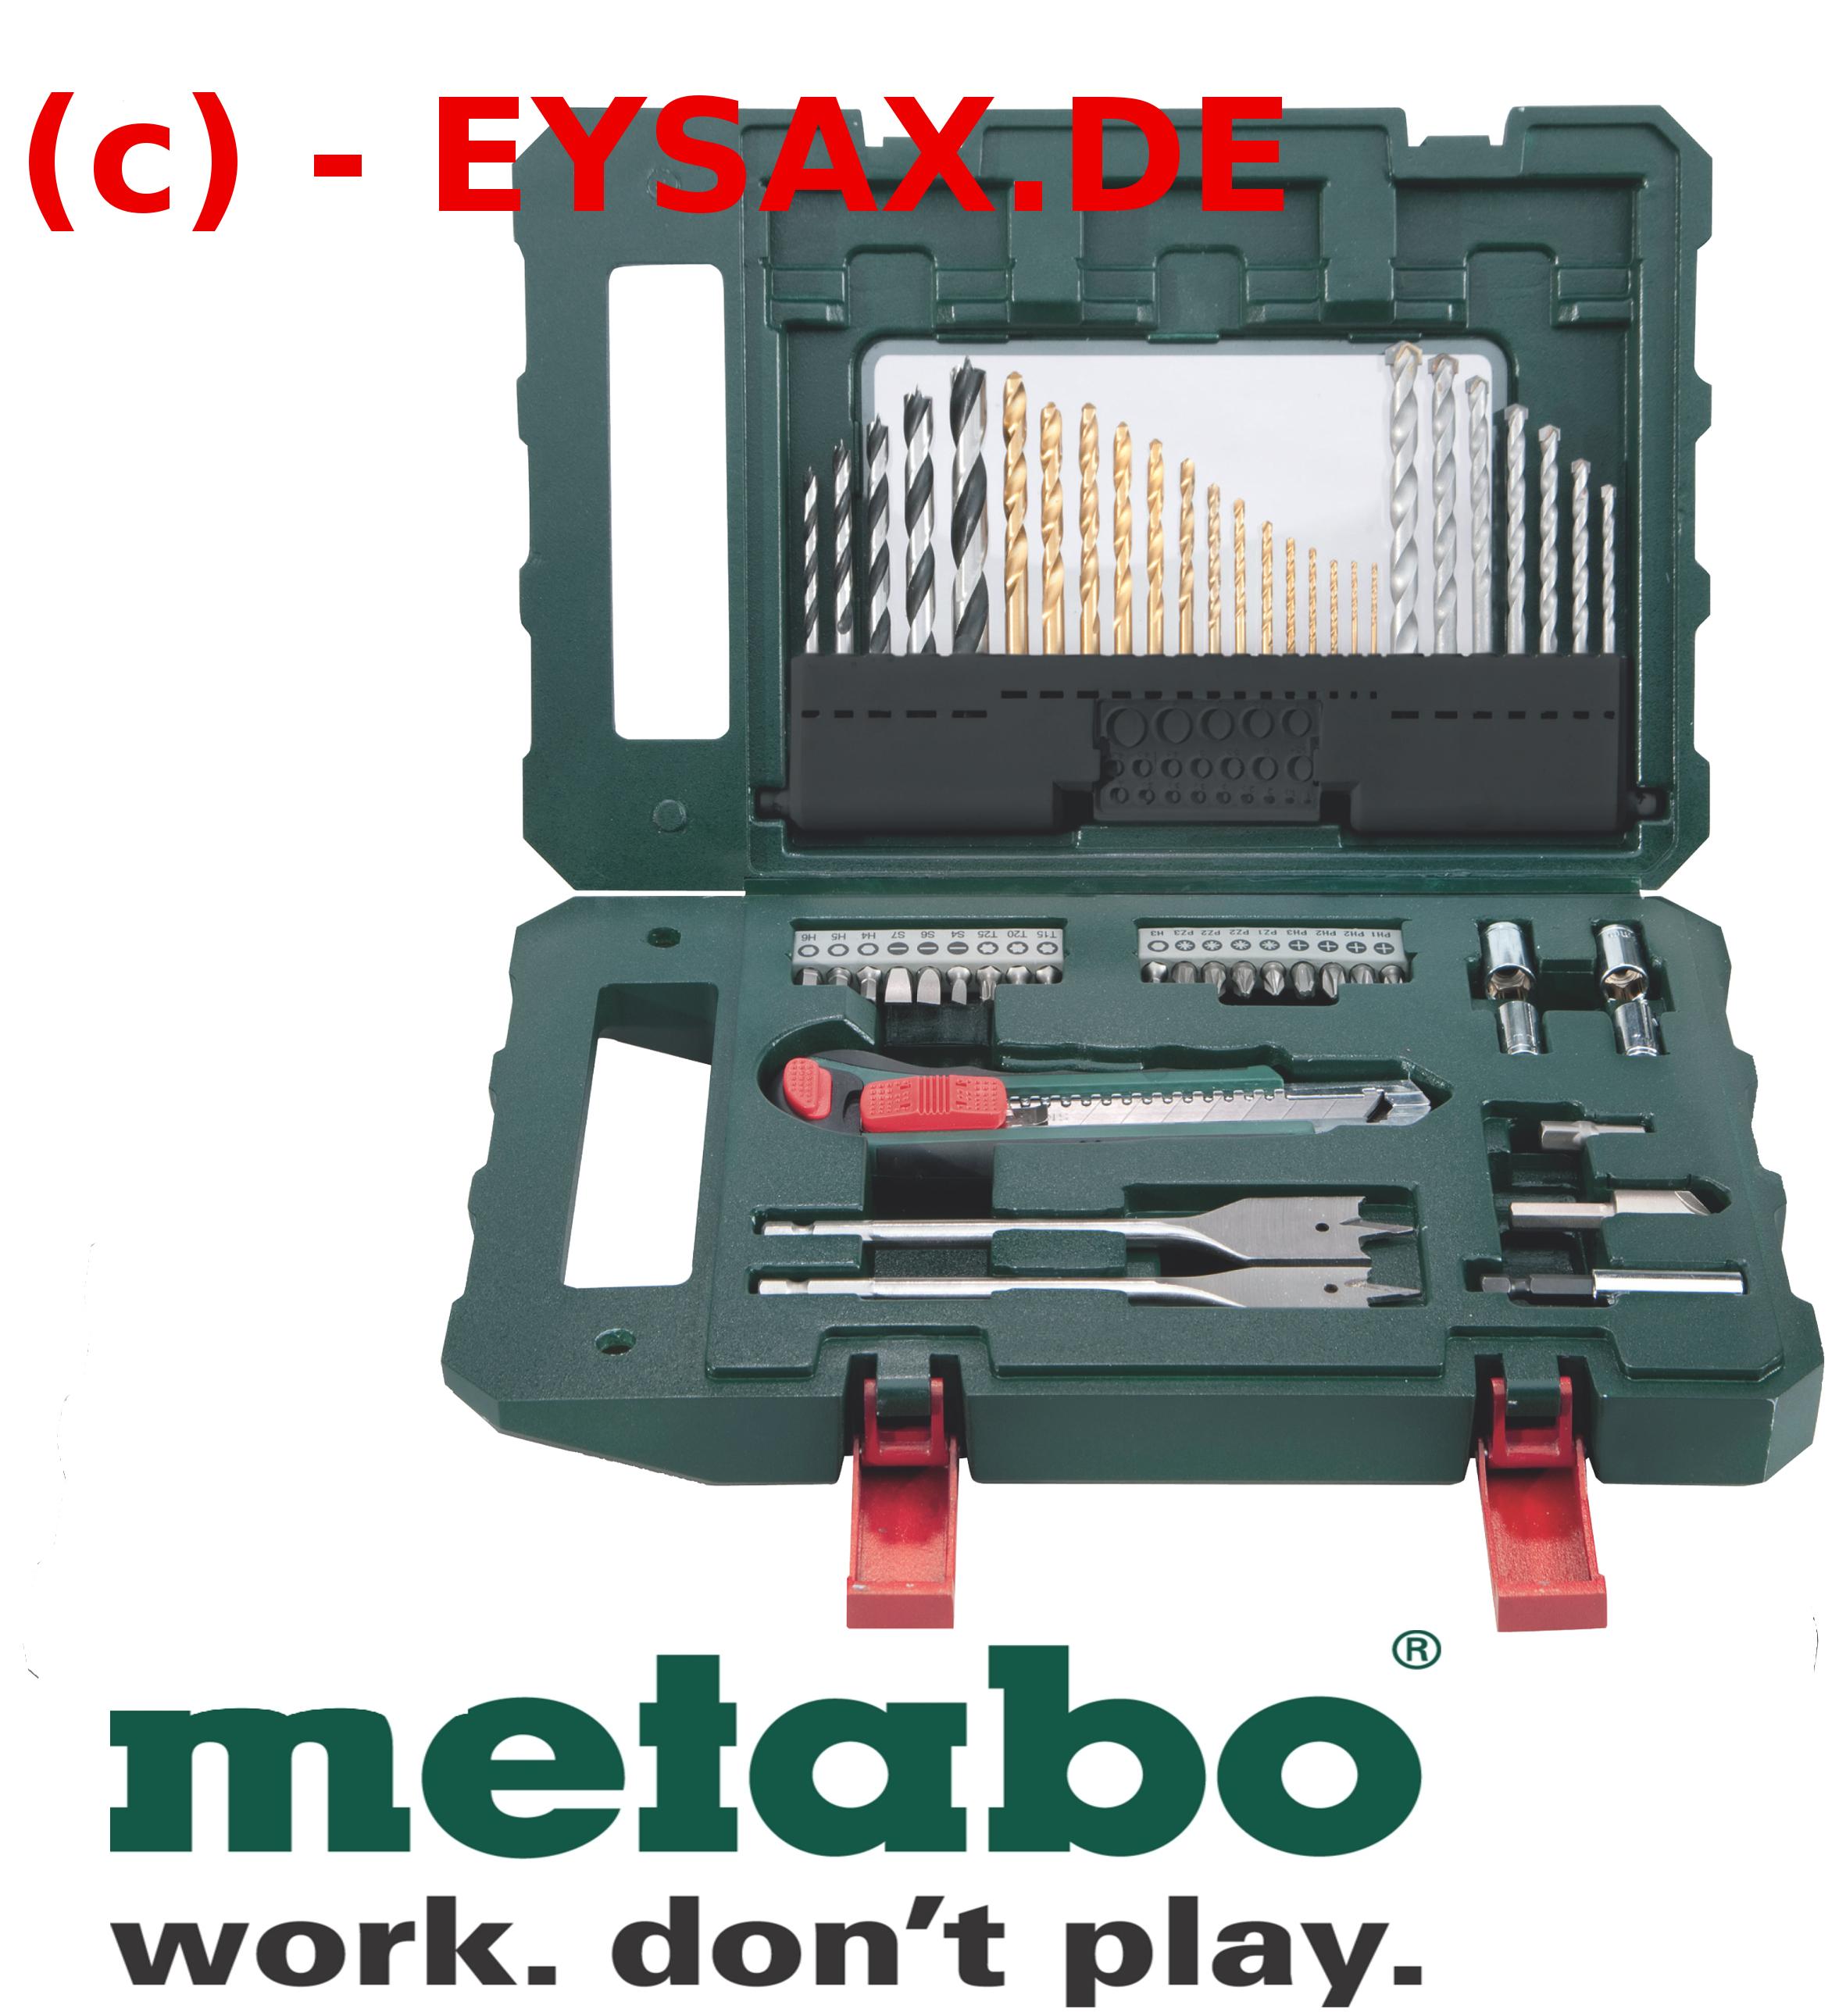 metabo akku bohrschrauber bs 18 li 2xakku koffer mobile werkstatt w 18volt ebay. Black Bedroom Furniture Sets. Home Design Ideas